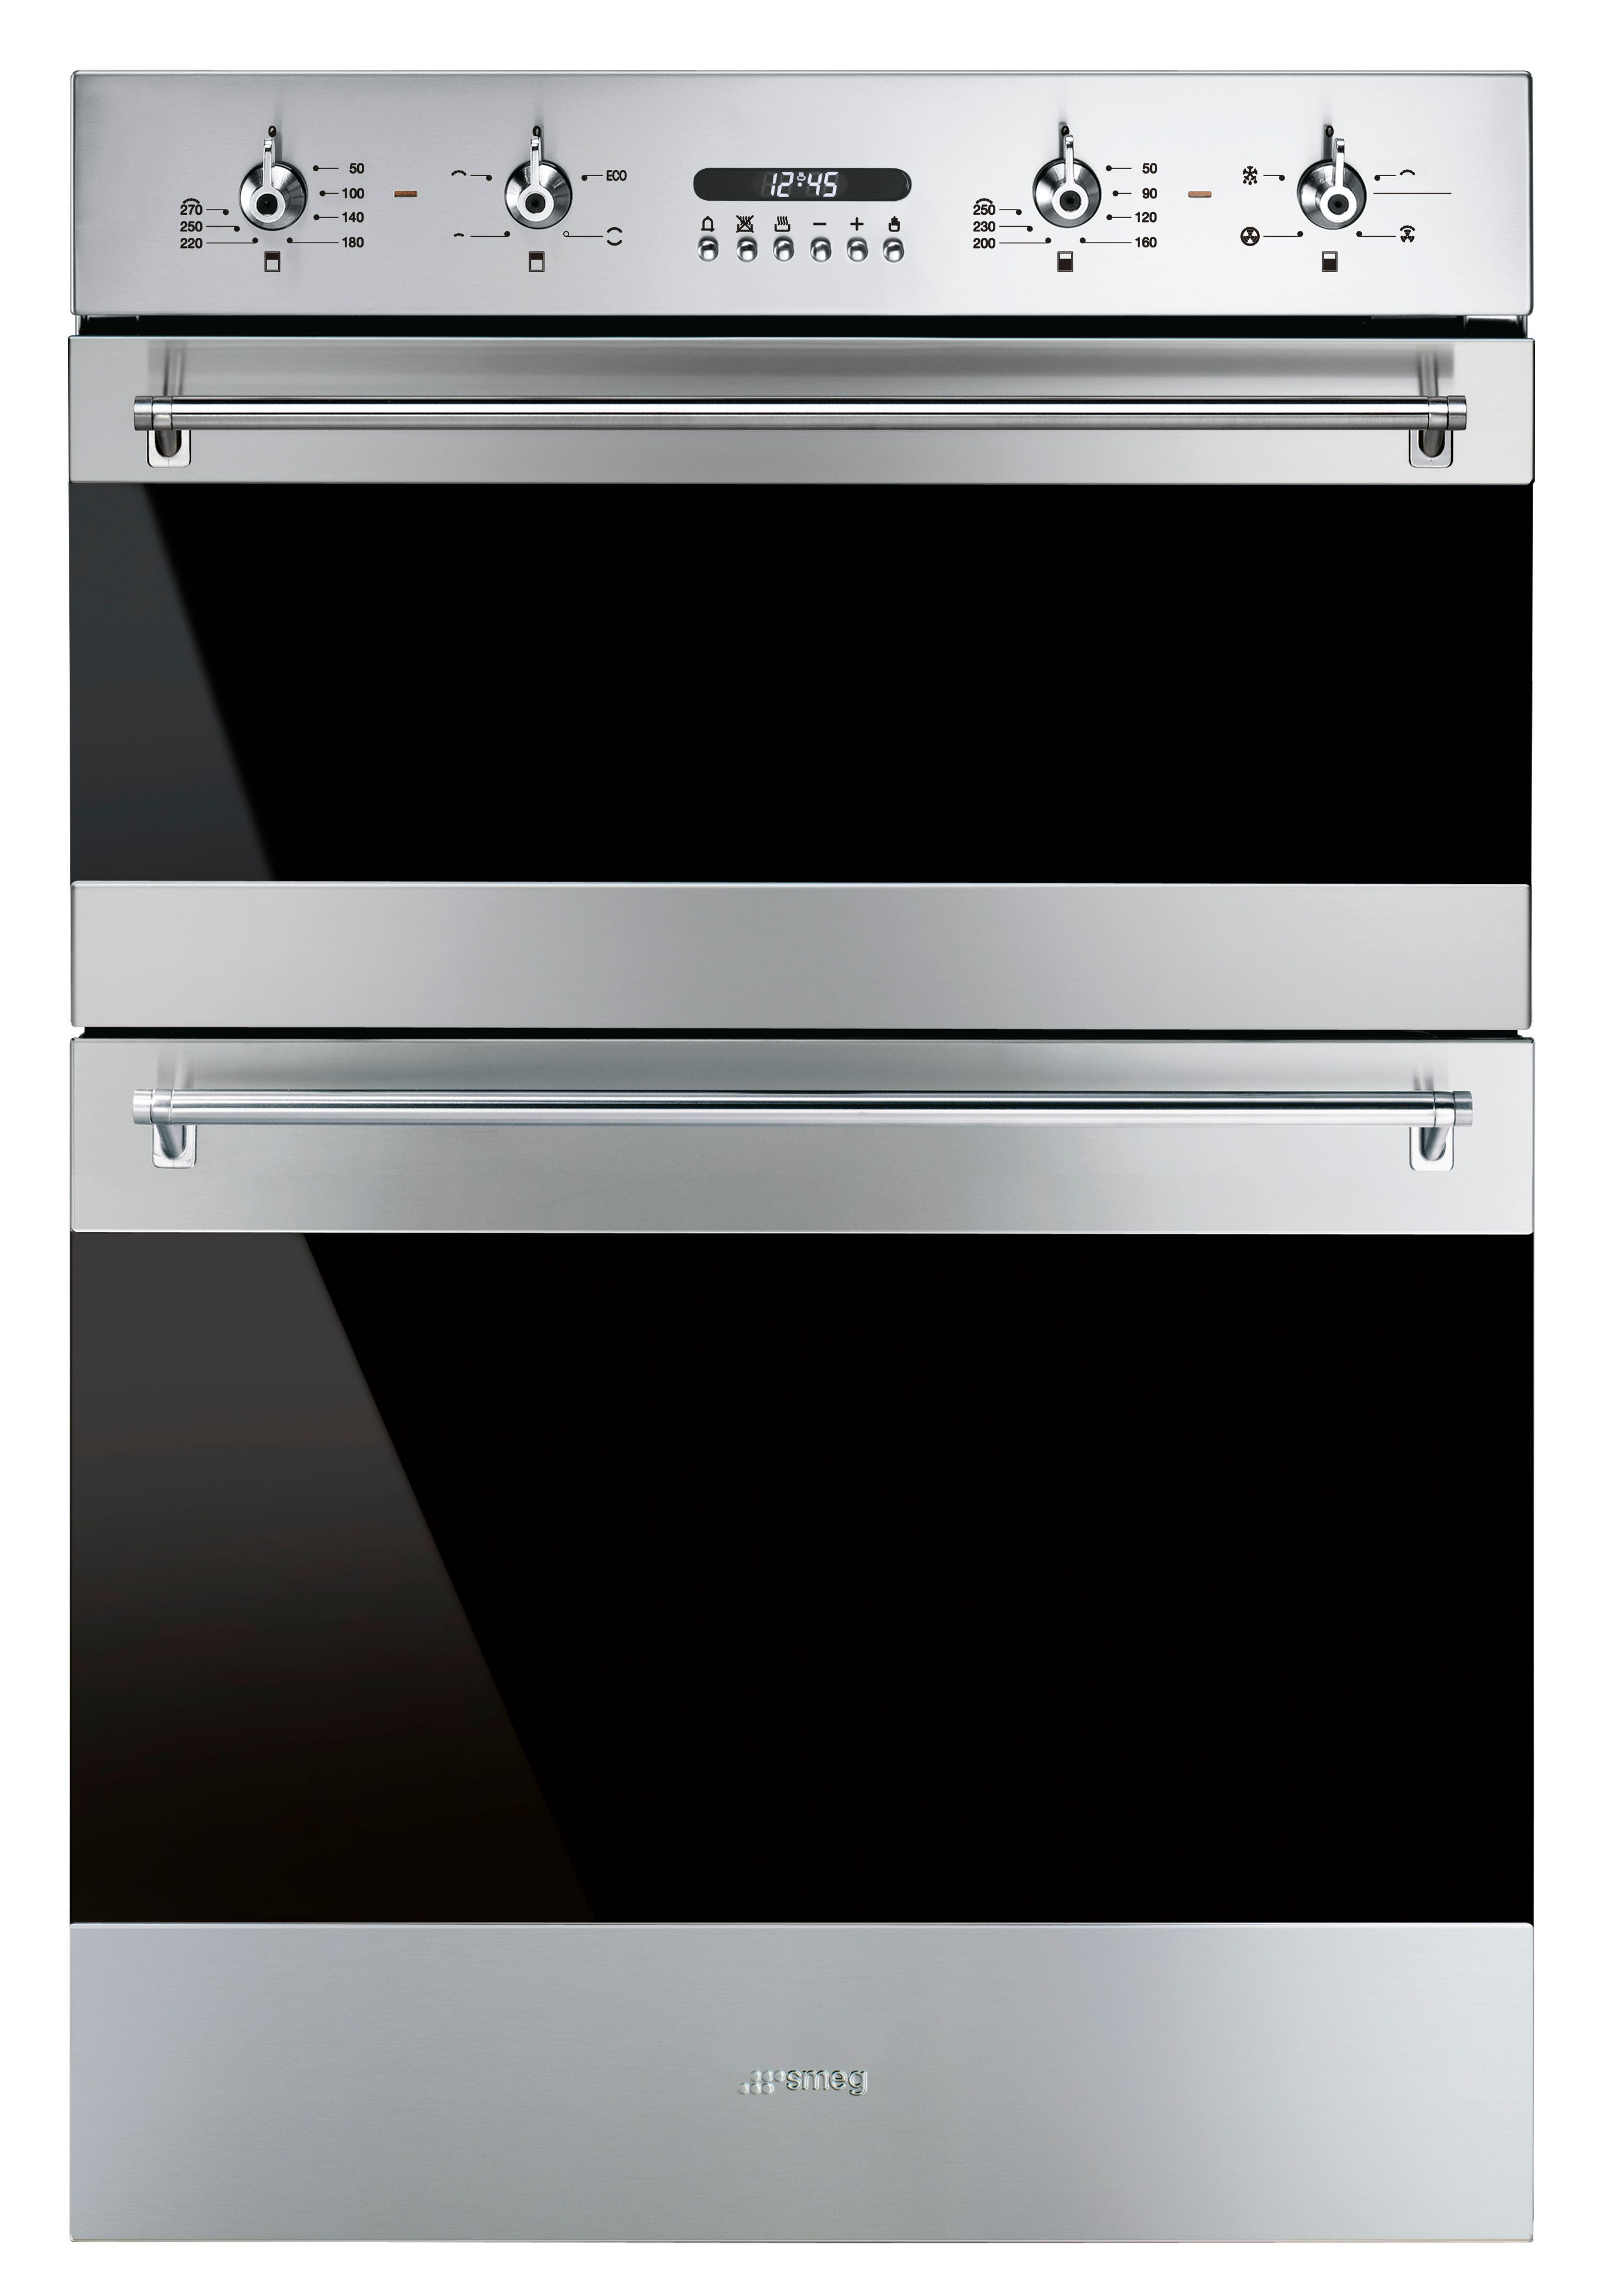 medium resolution of smeg double oven wiring diagram oven stainless rh pinterest com design